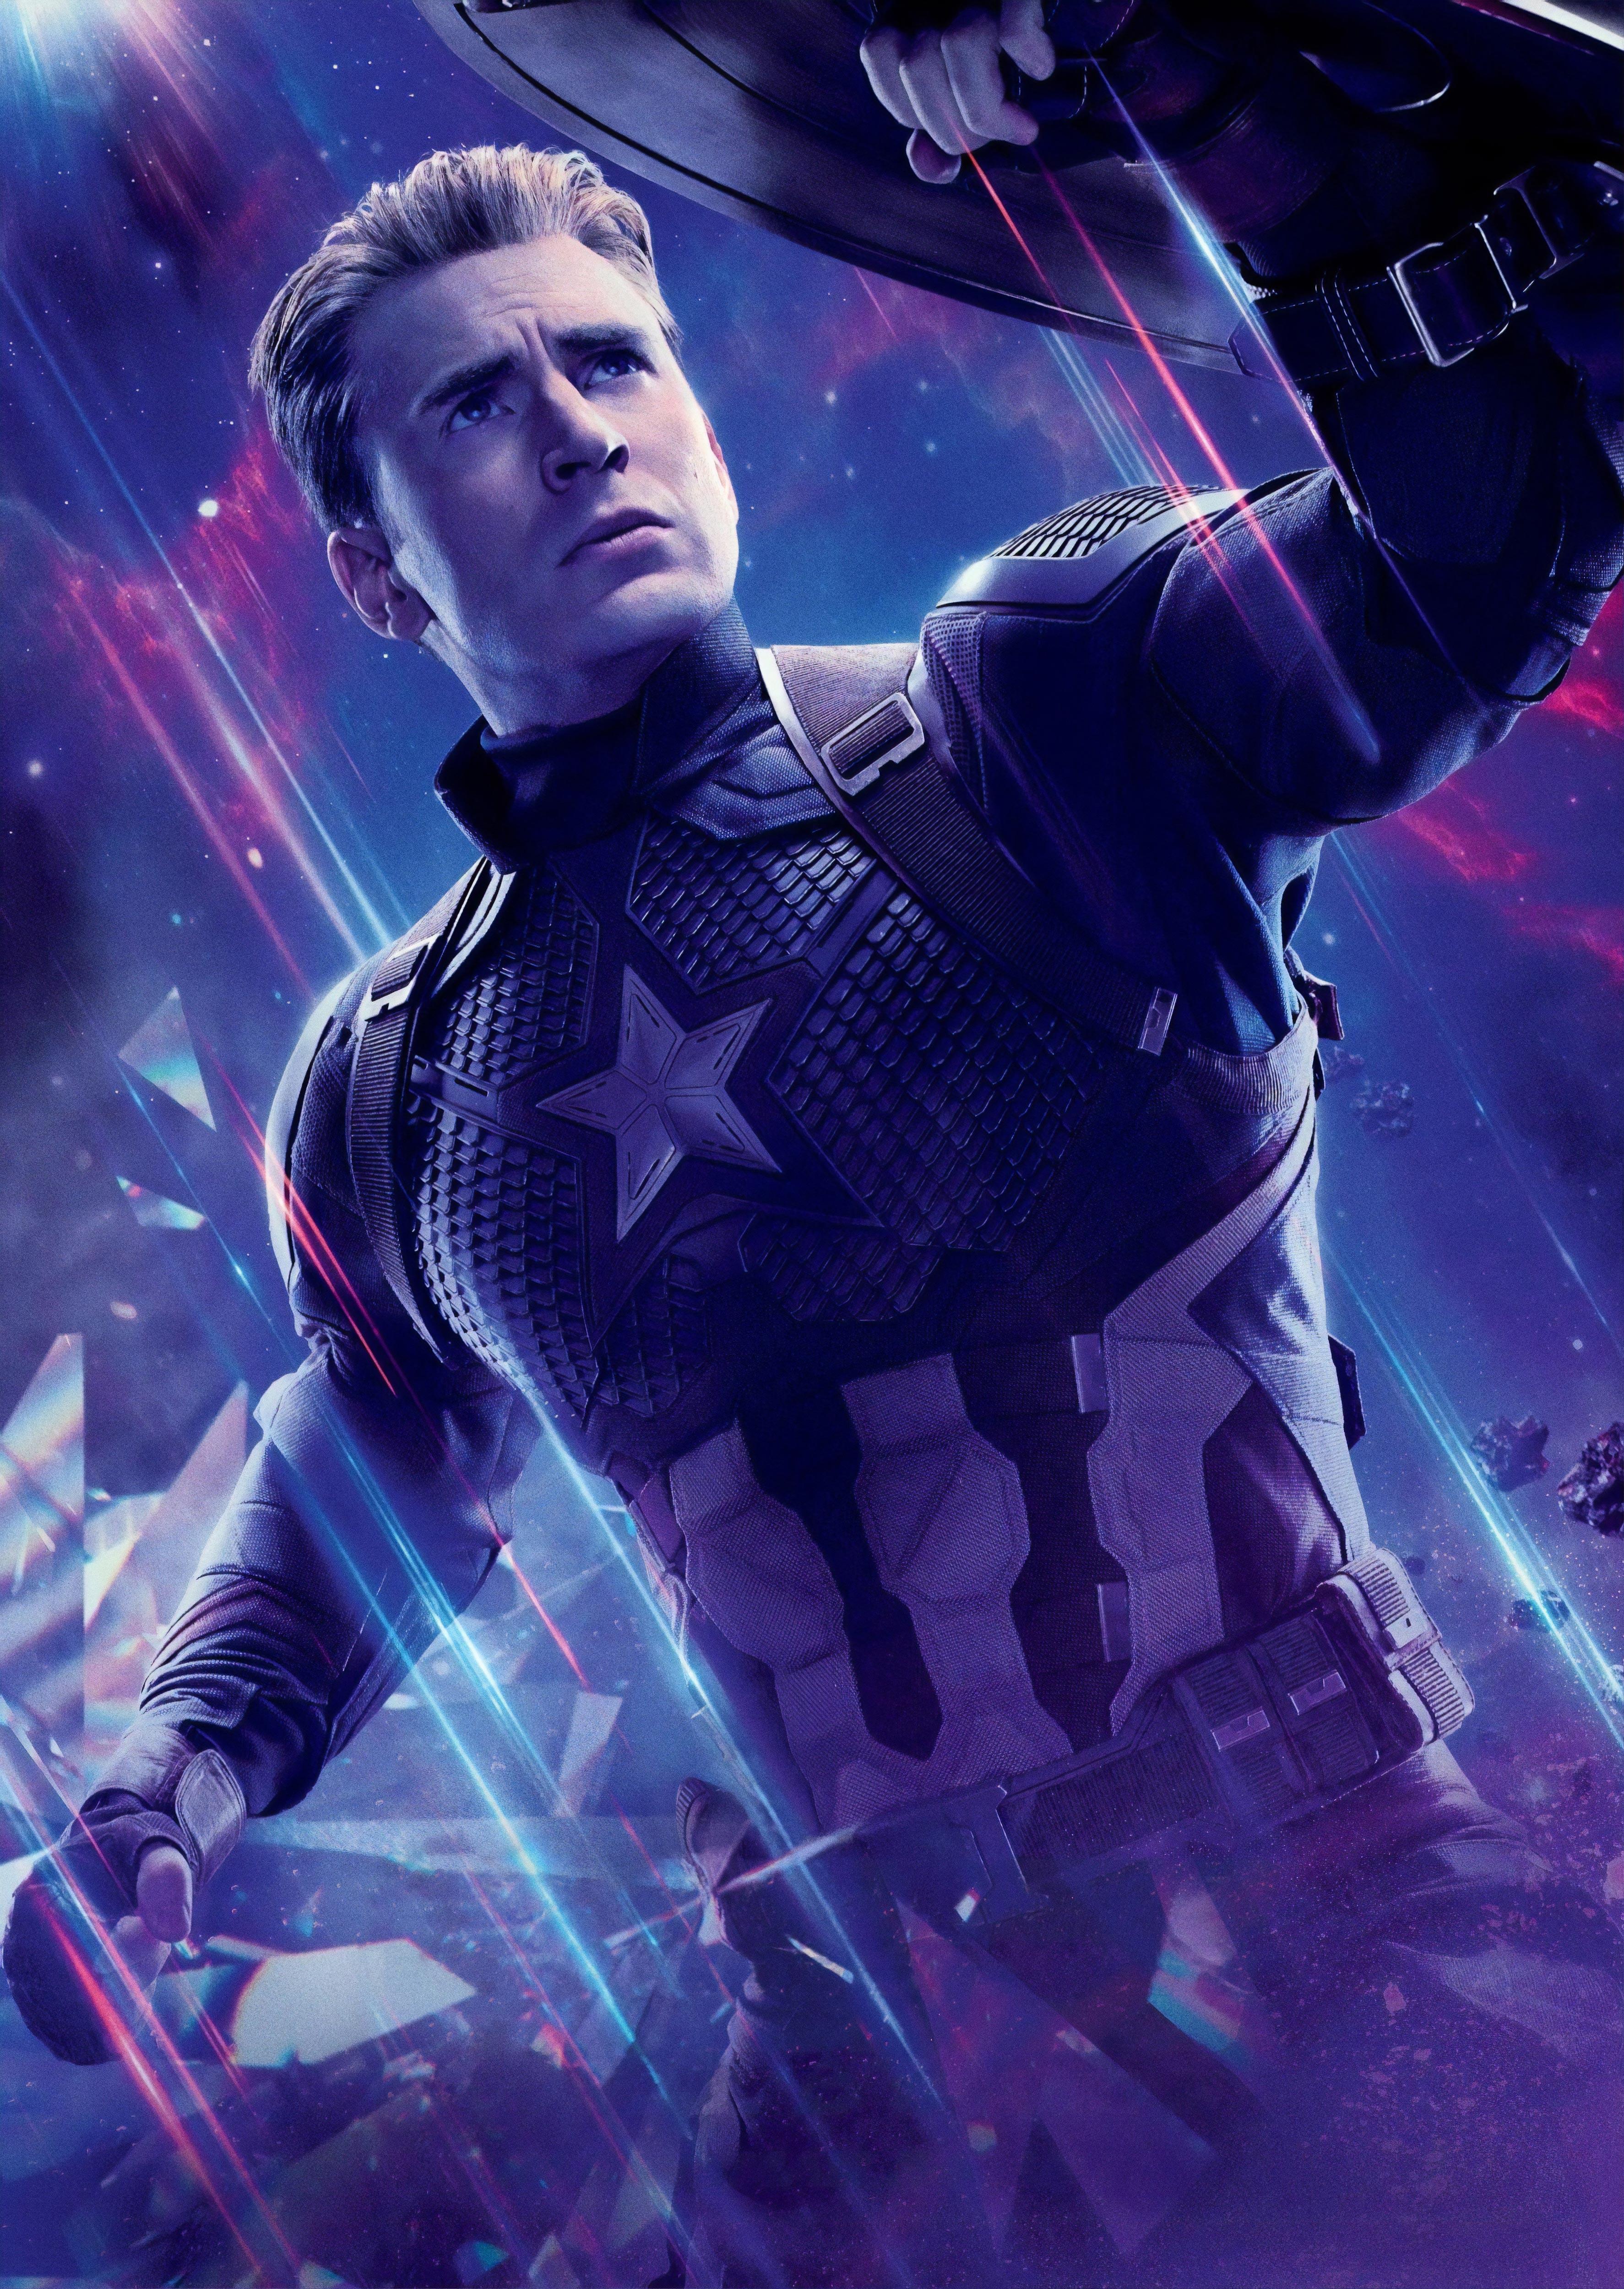 Captain America In Avengers Endgame Wallpaper Hd Movies 4k